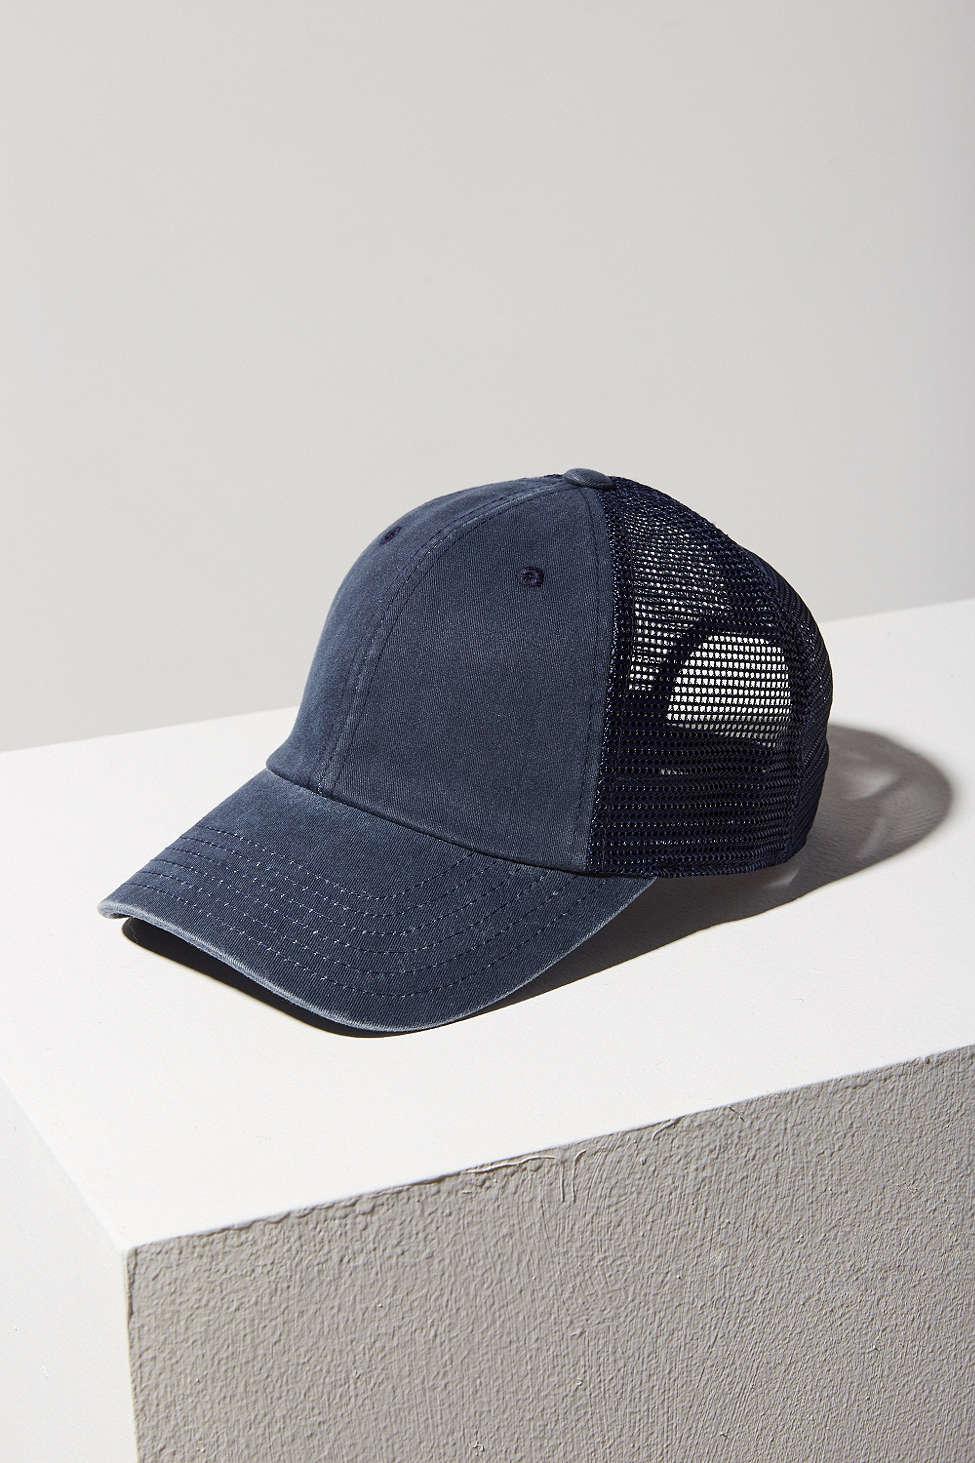 e83b7f15ff5 spain new york yankees hat pacsun knife 00ac3 95c59